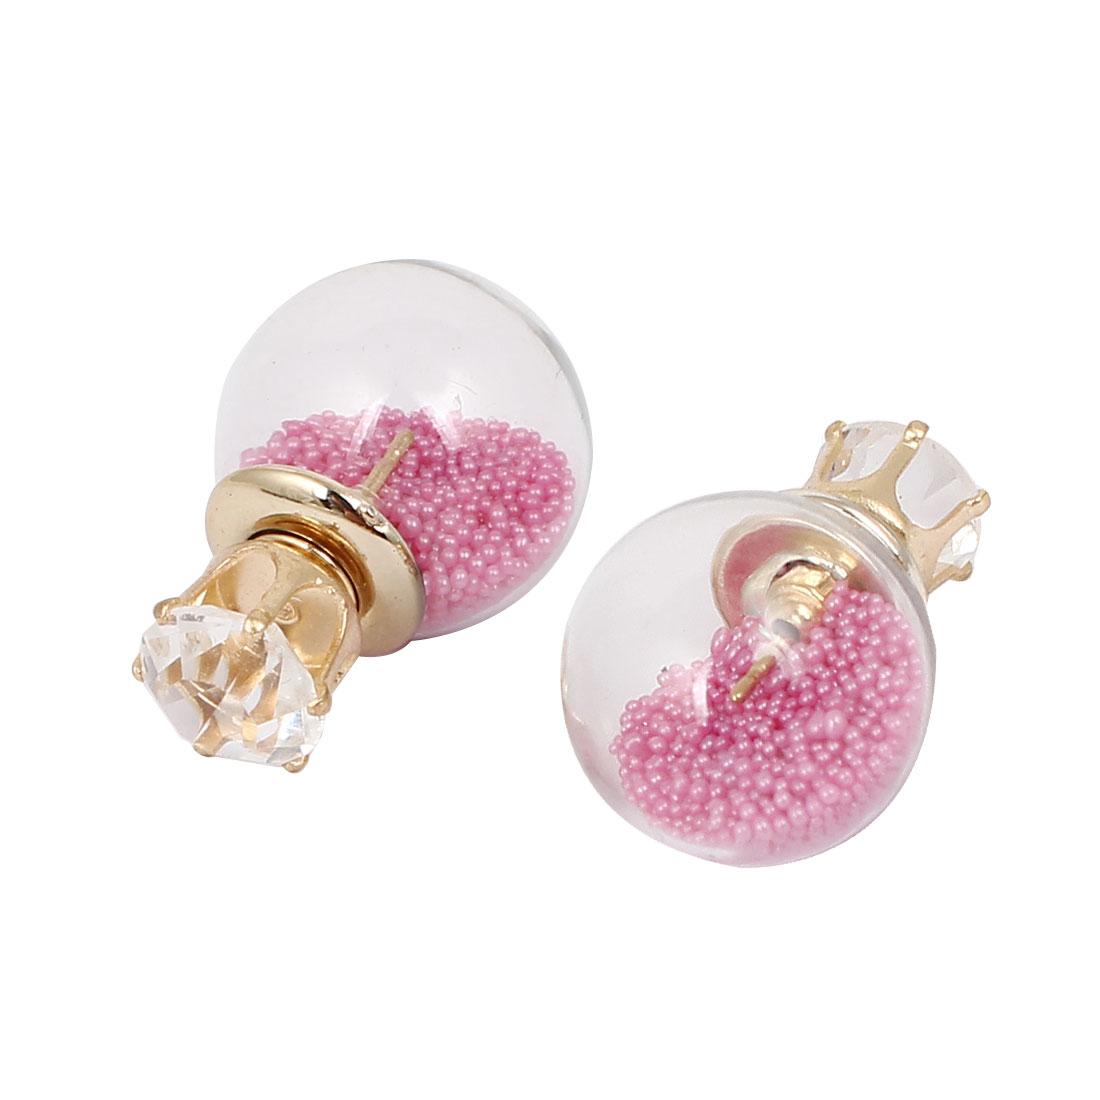 Lady Faux Crystal Decor Round Bulb Design Double Side Stud Earrings Fuchsia Pair